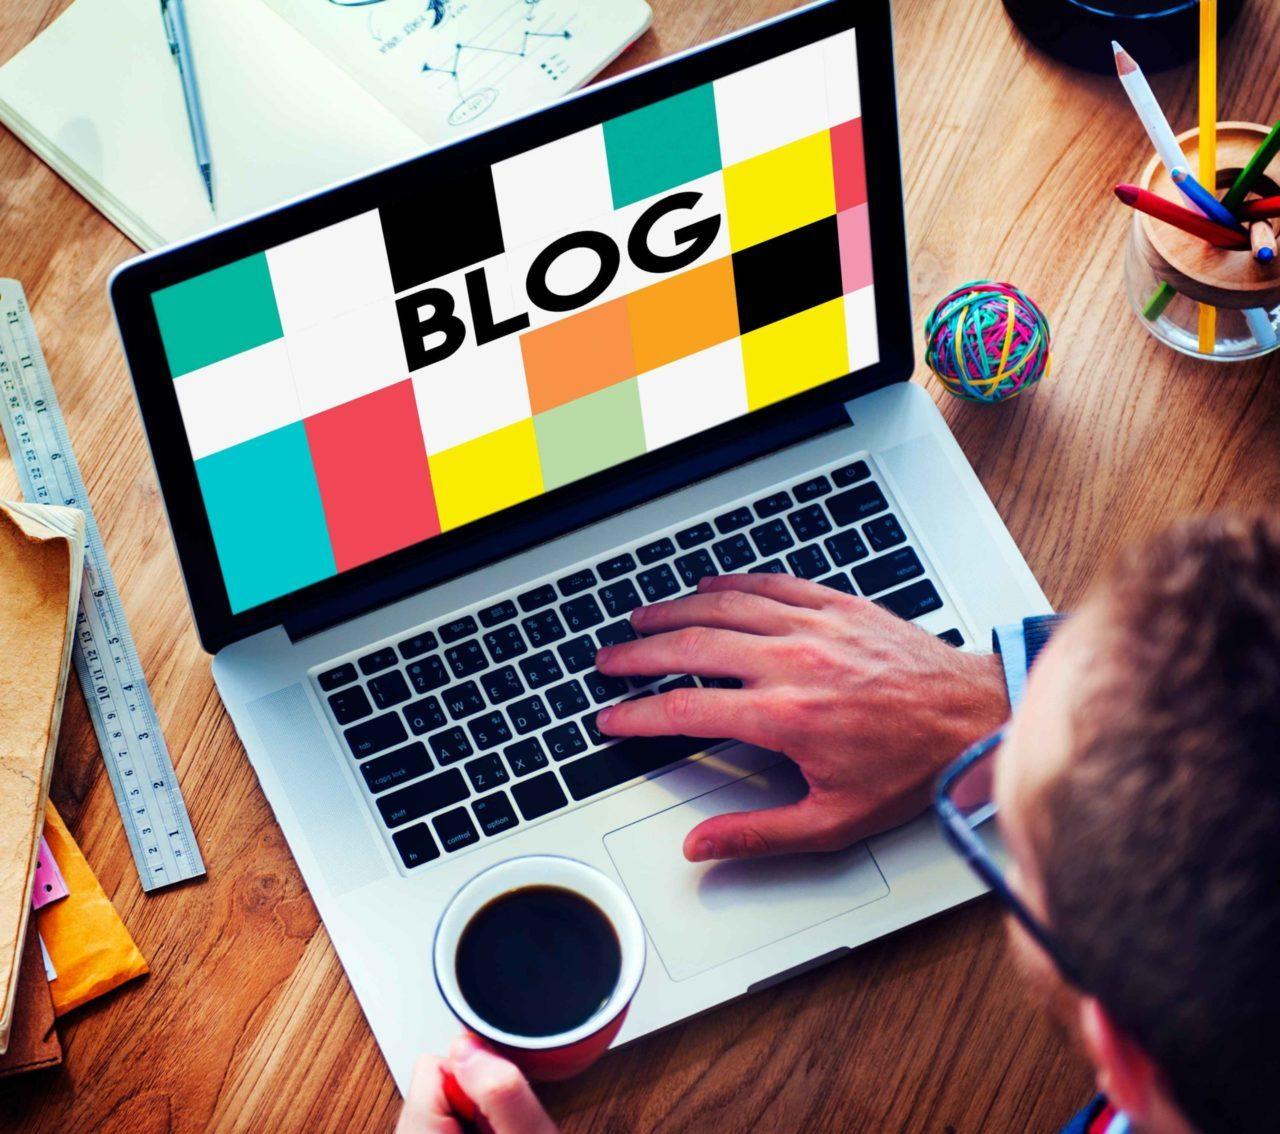 blog-blogging-homepage-social-media-network-concep-Q6RVKG3